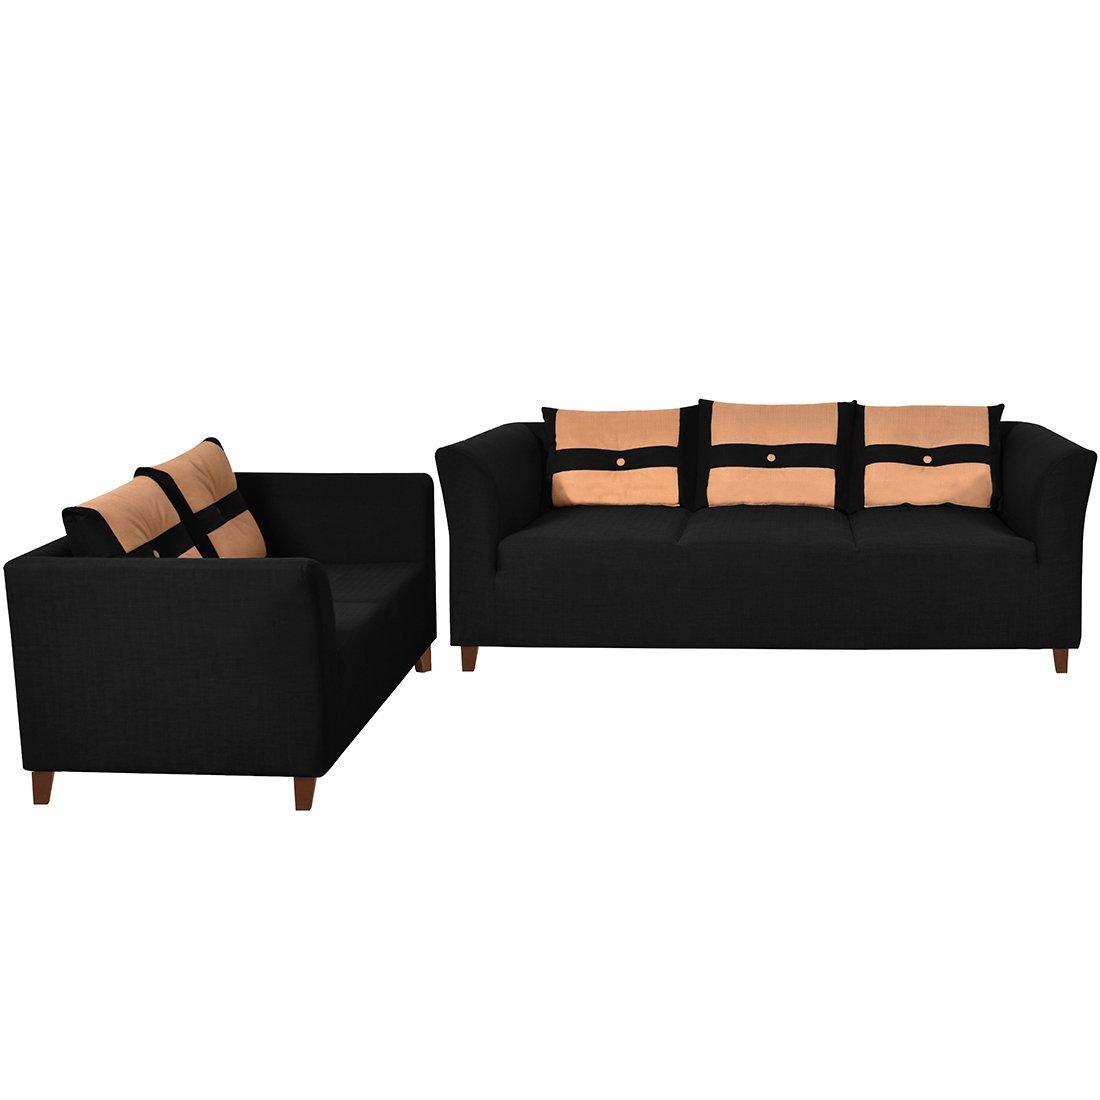 manhattan five seater sofa set 3 1 brown protect dog | www.gradschoolfairs.com